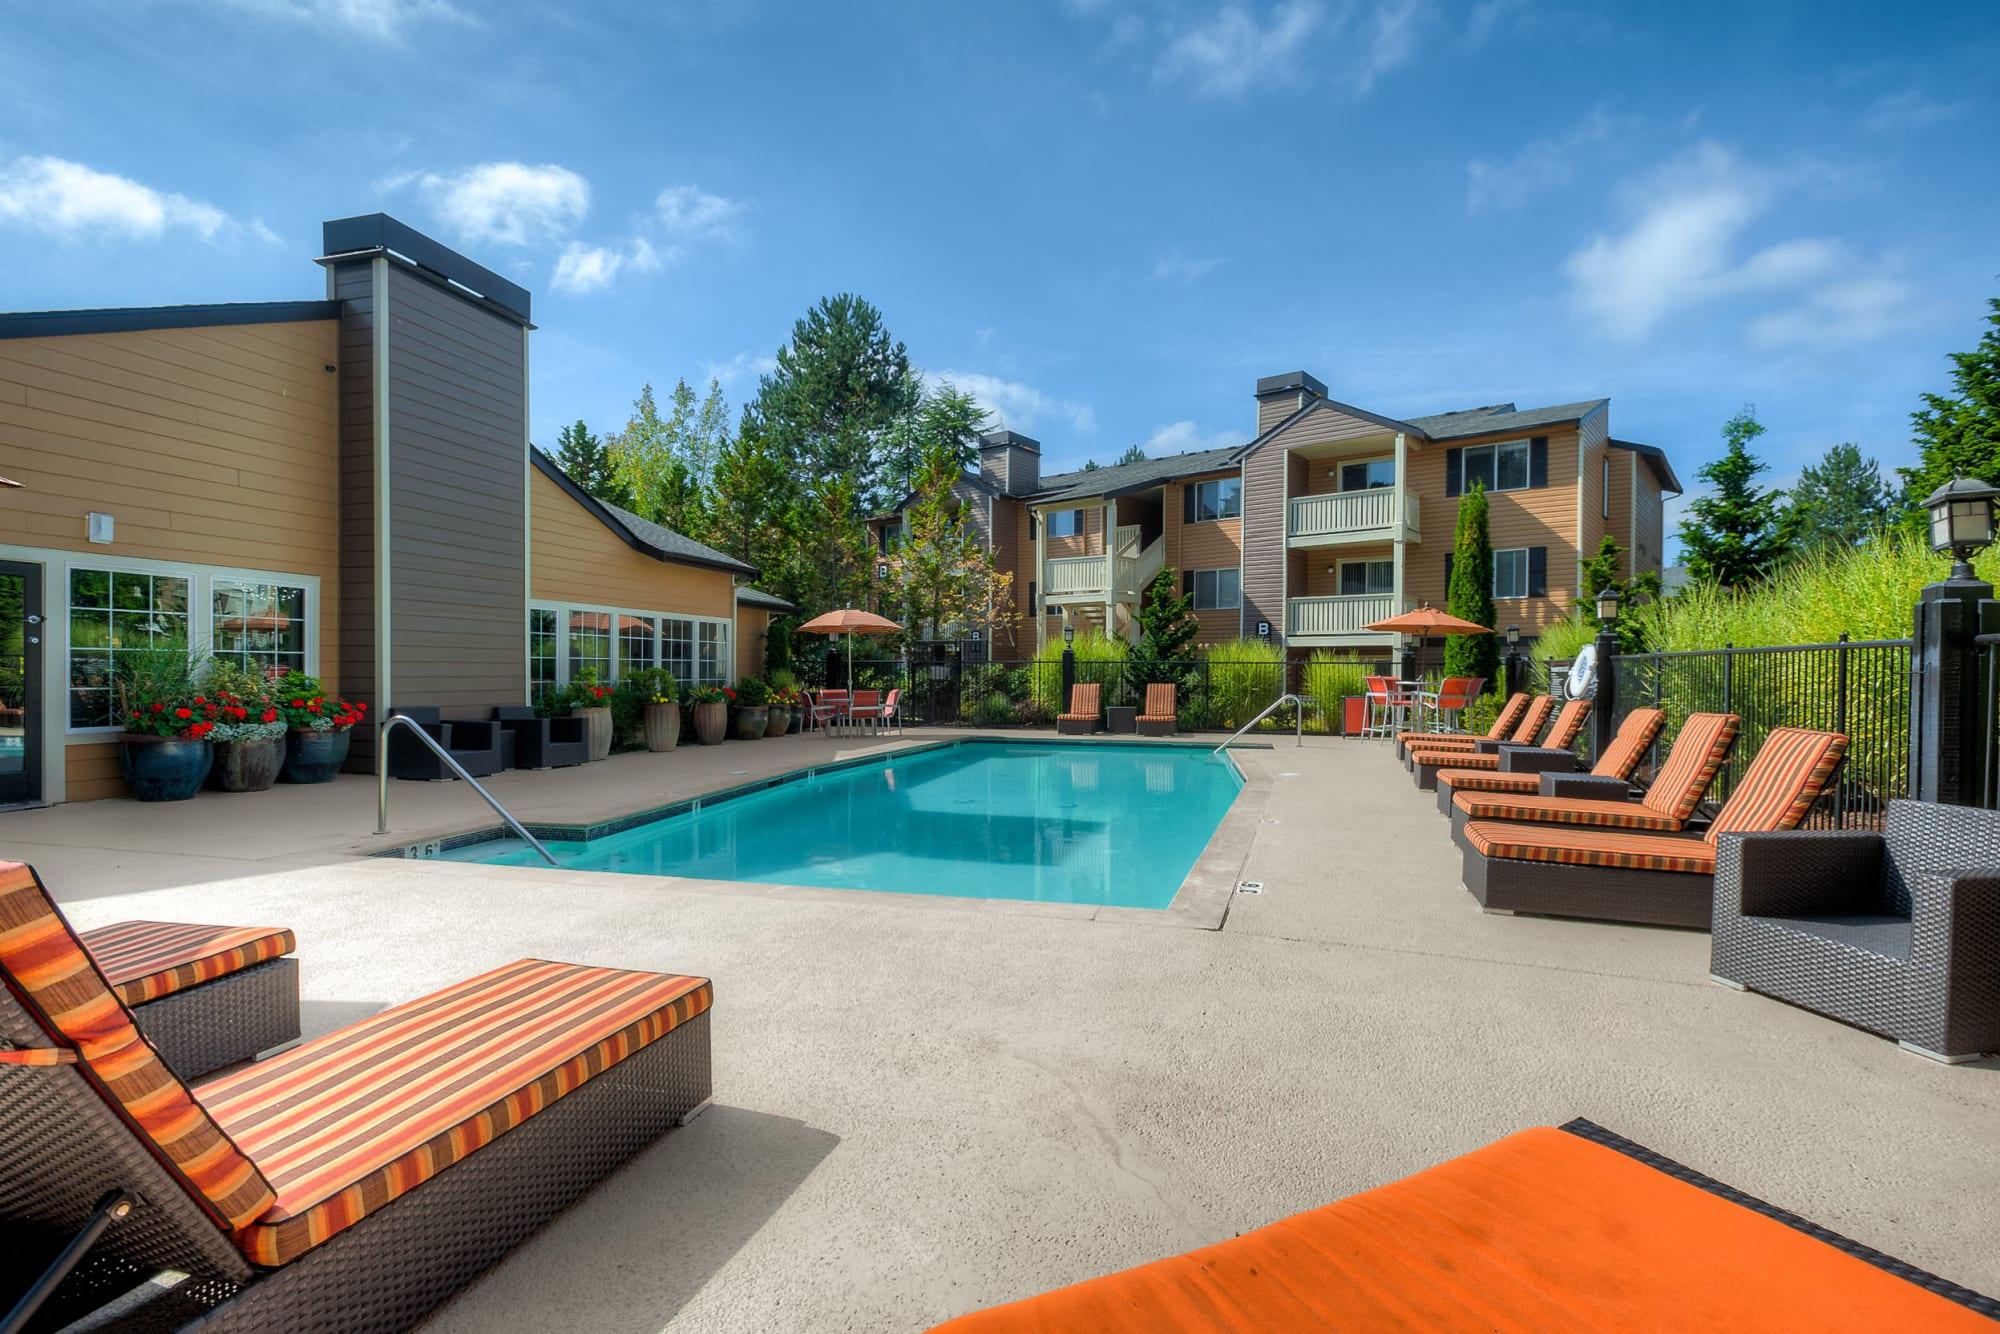 Pool deck at Newport Crossing Apartments